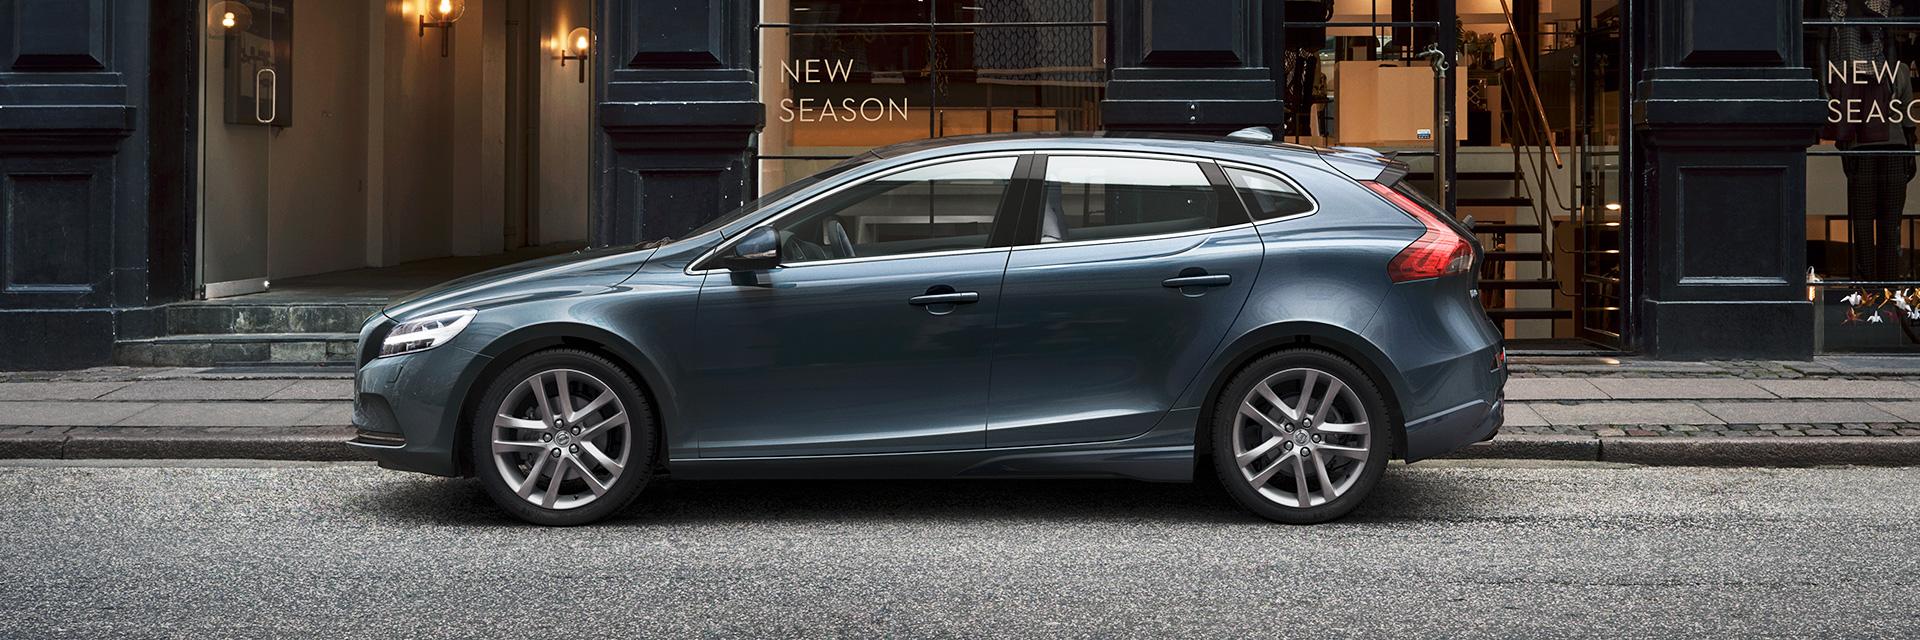 Volvo V40 Edition 90